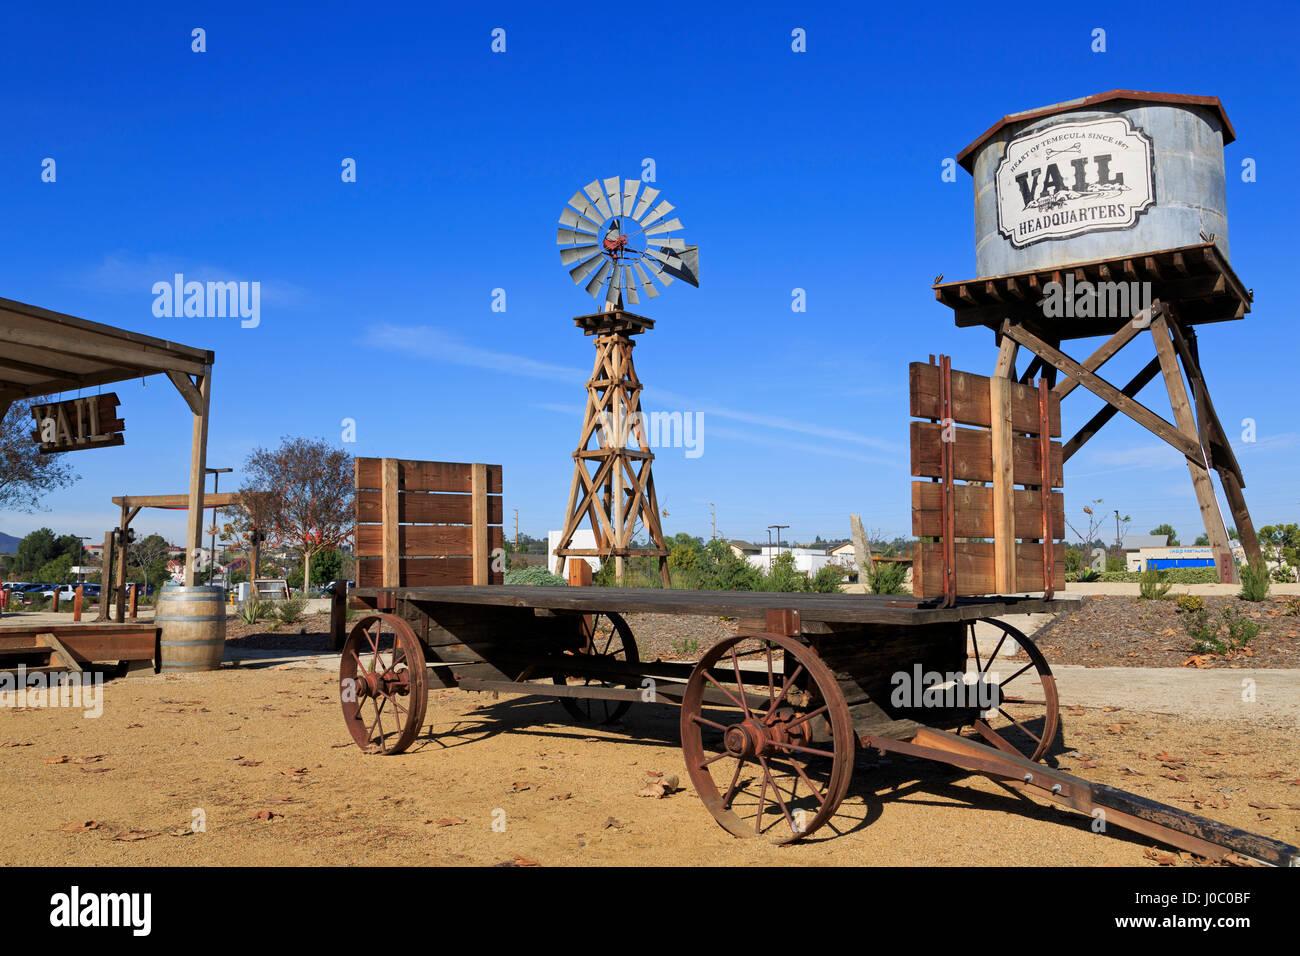 Windmill, Vail Headquarters Heritage Park, Temecula, California, USA - Stock Image